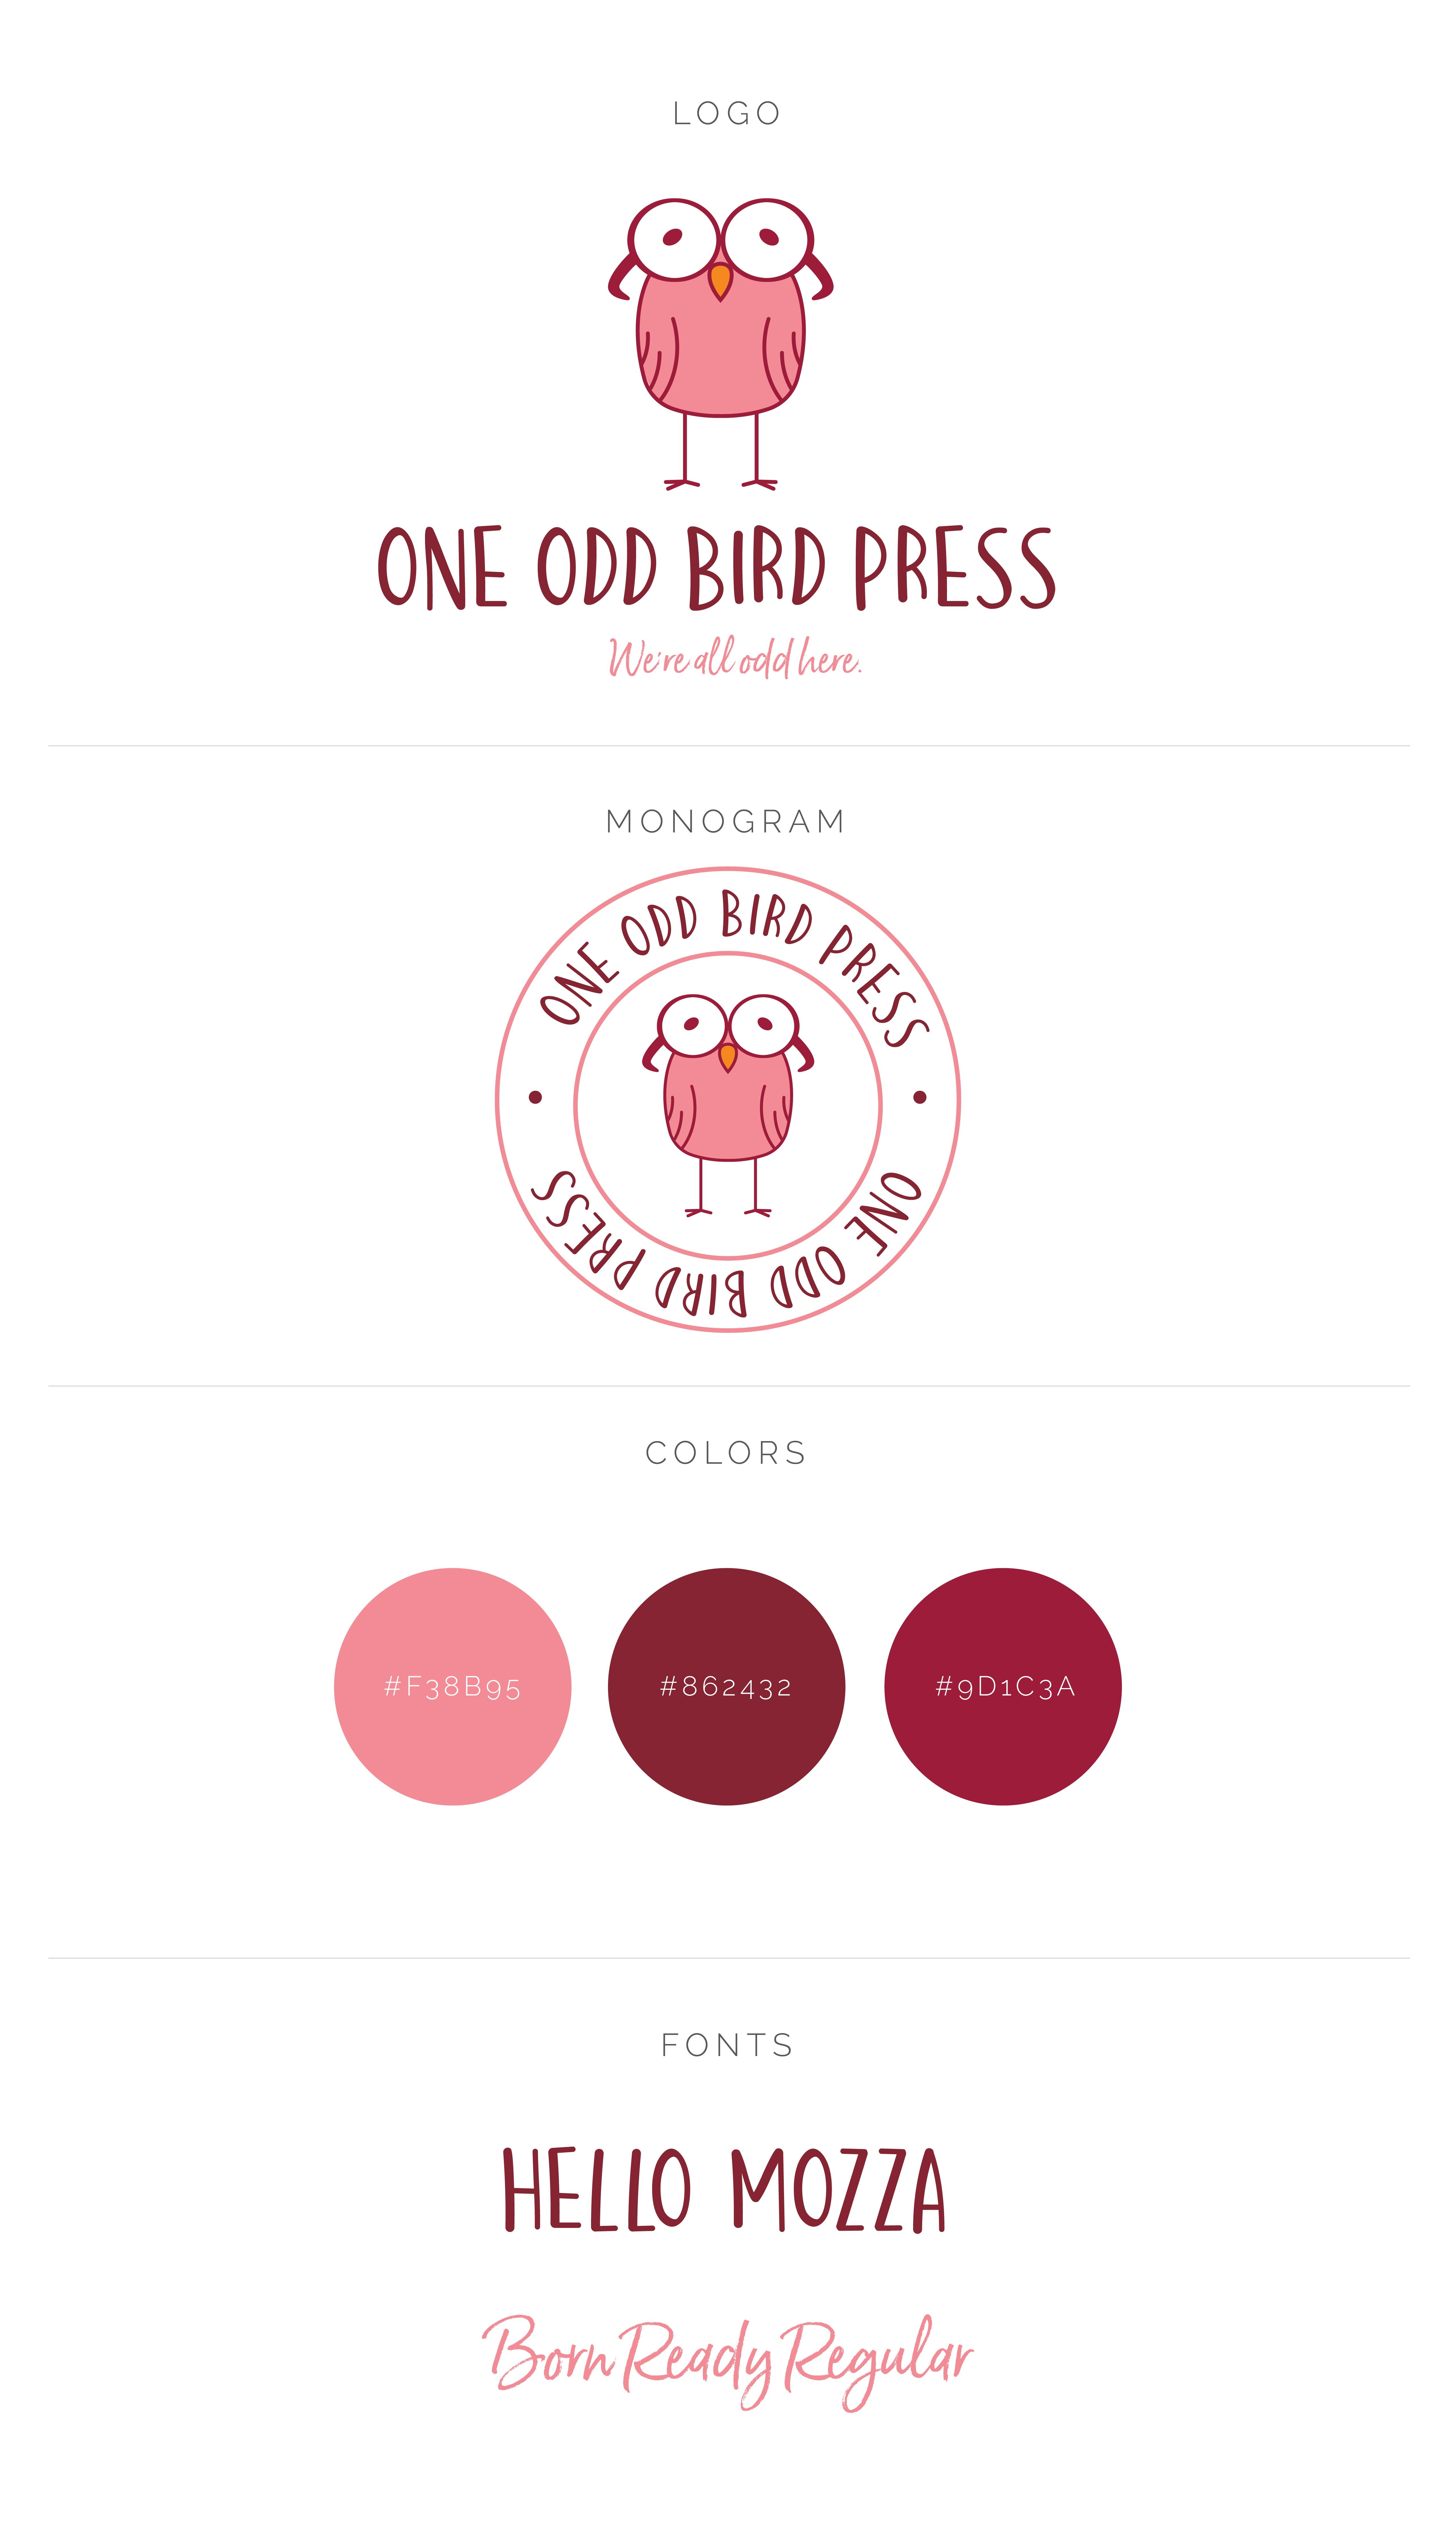 OneOddBirdPress_BrandingSheet-01